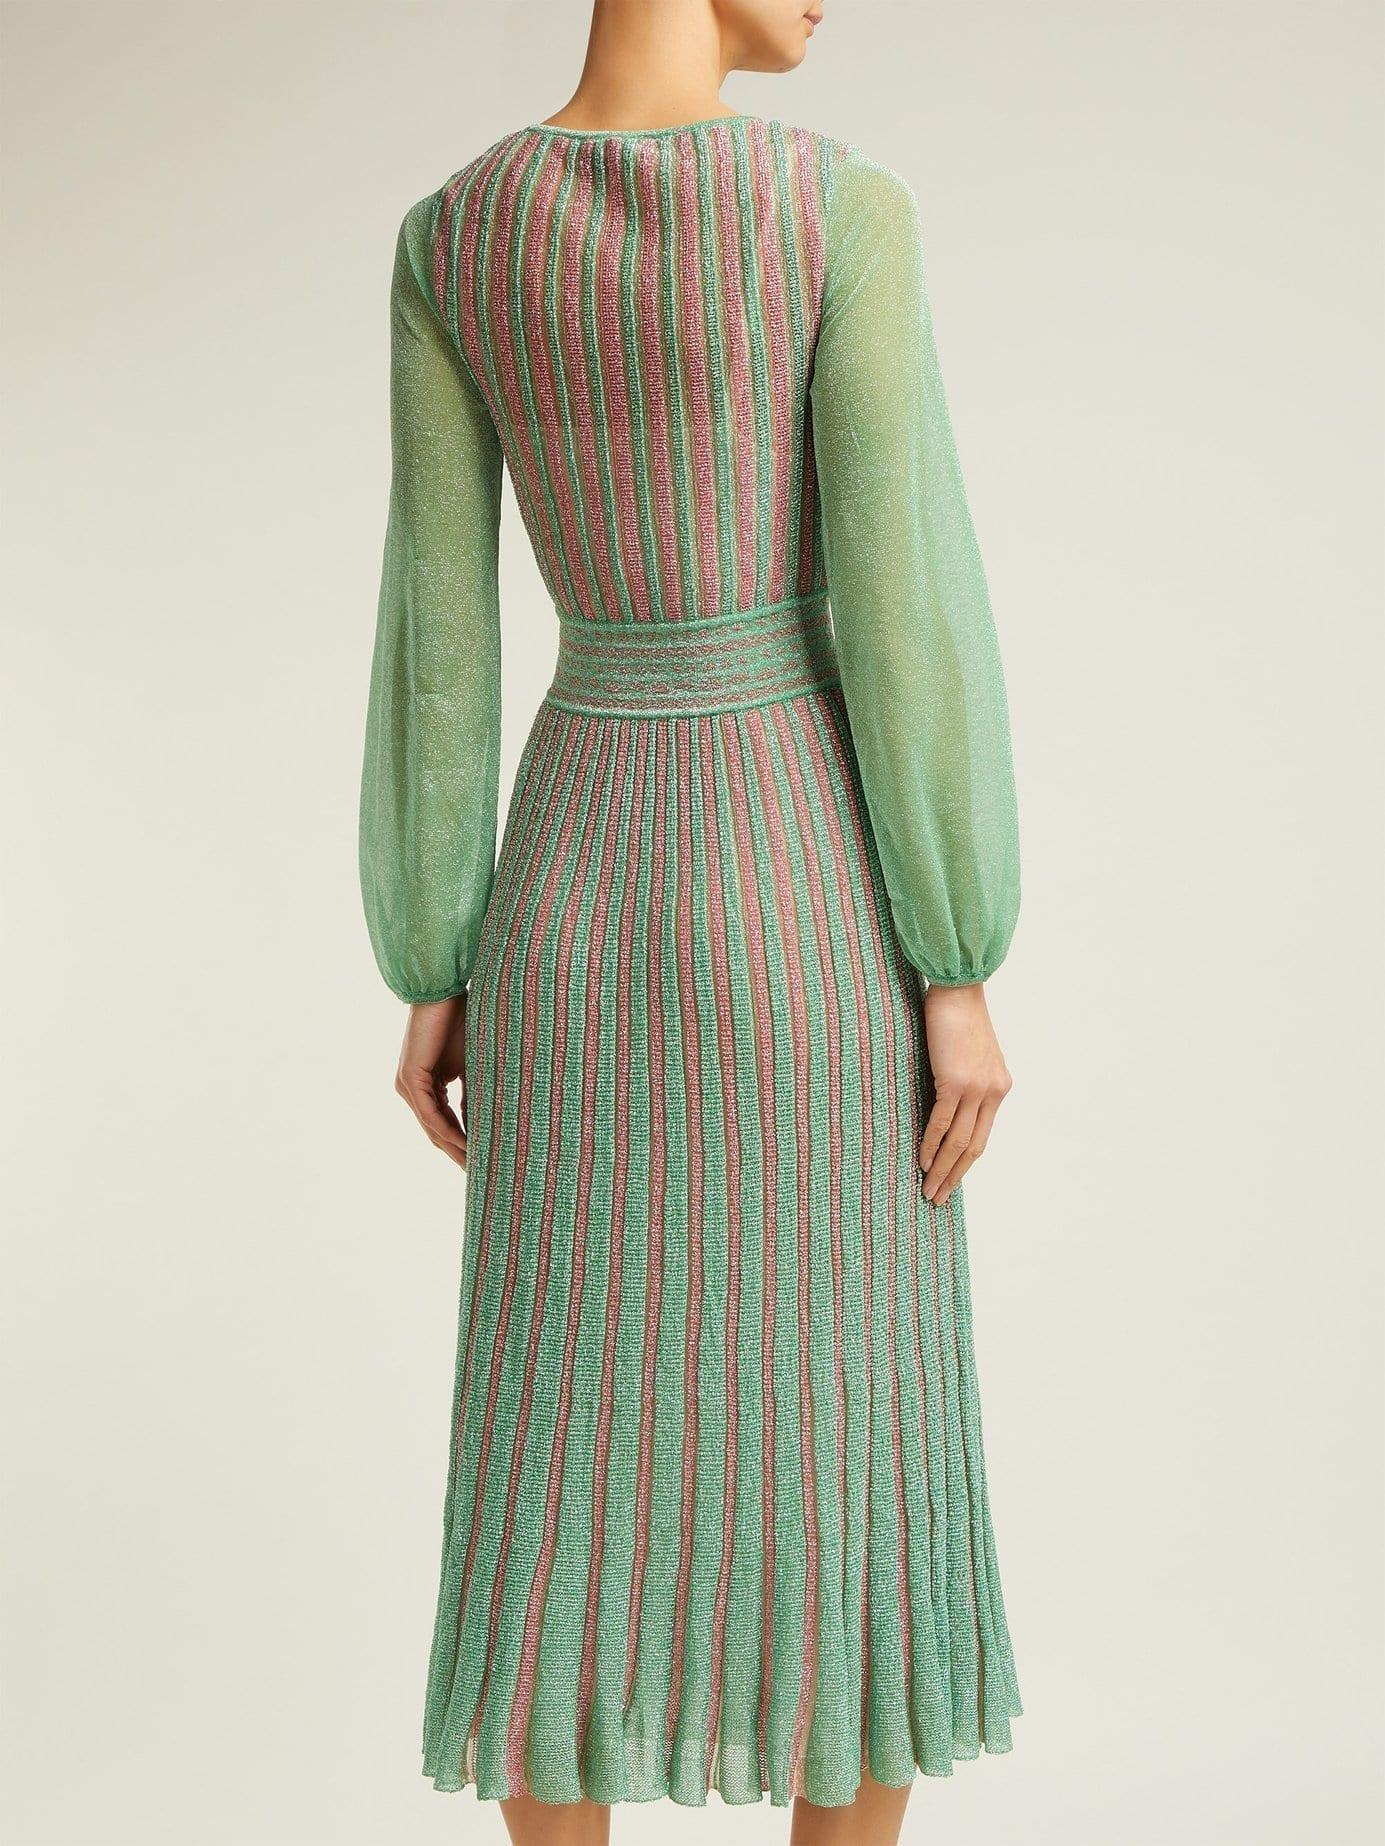 9d80866697f MISSONI Metallic Striped Wrap Green Dress - We Select Dresses